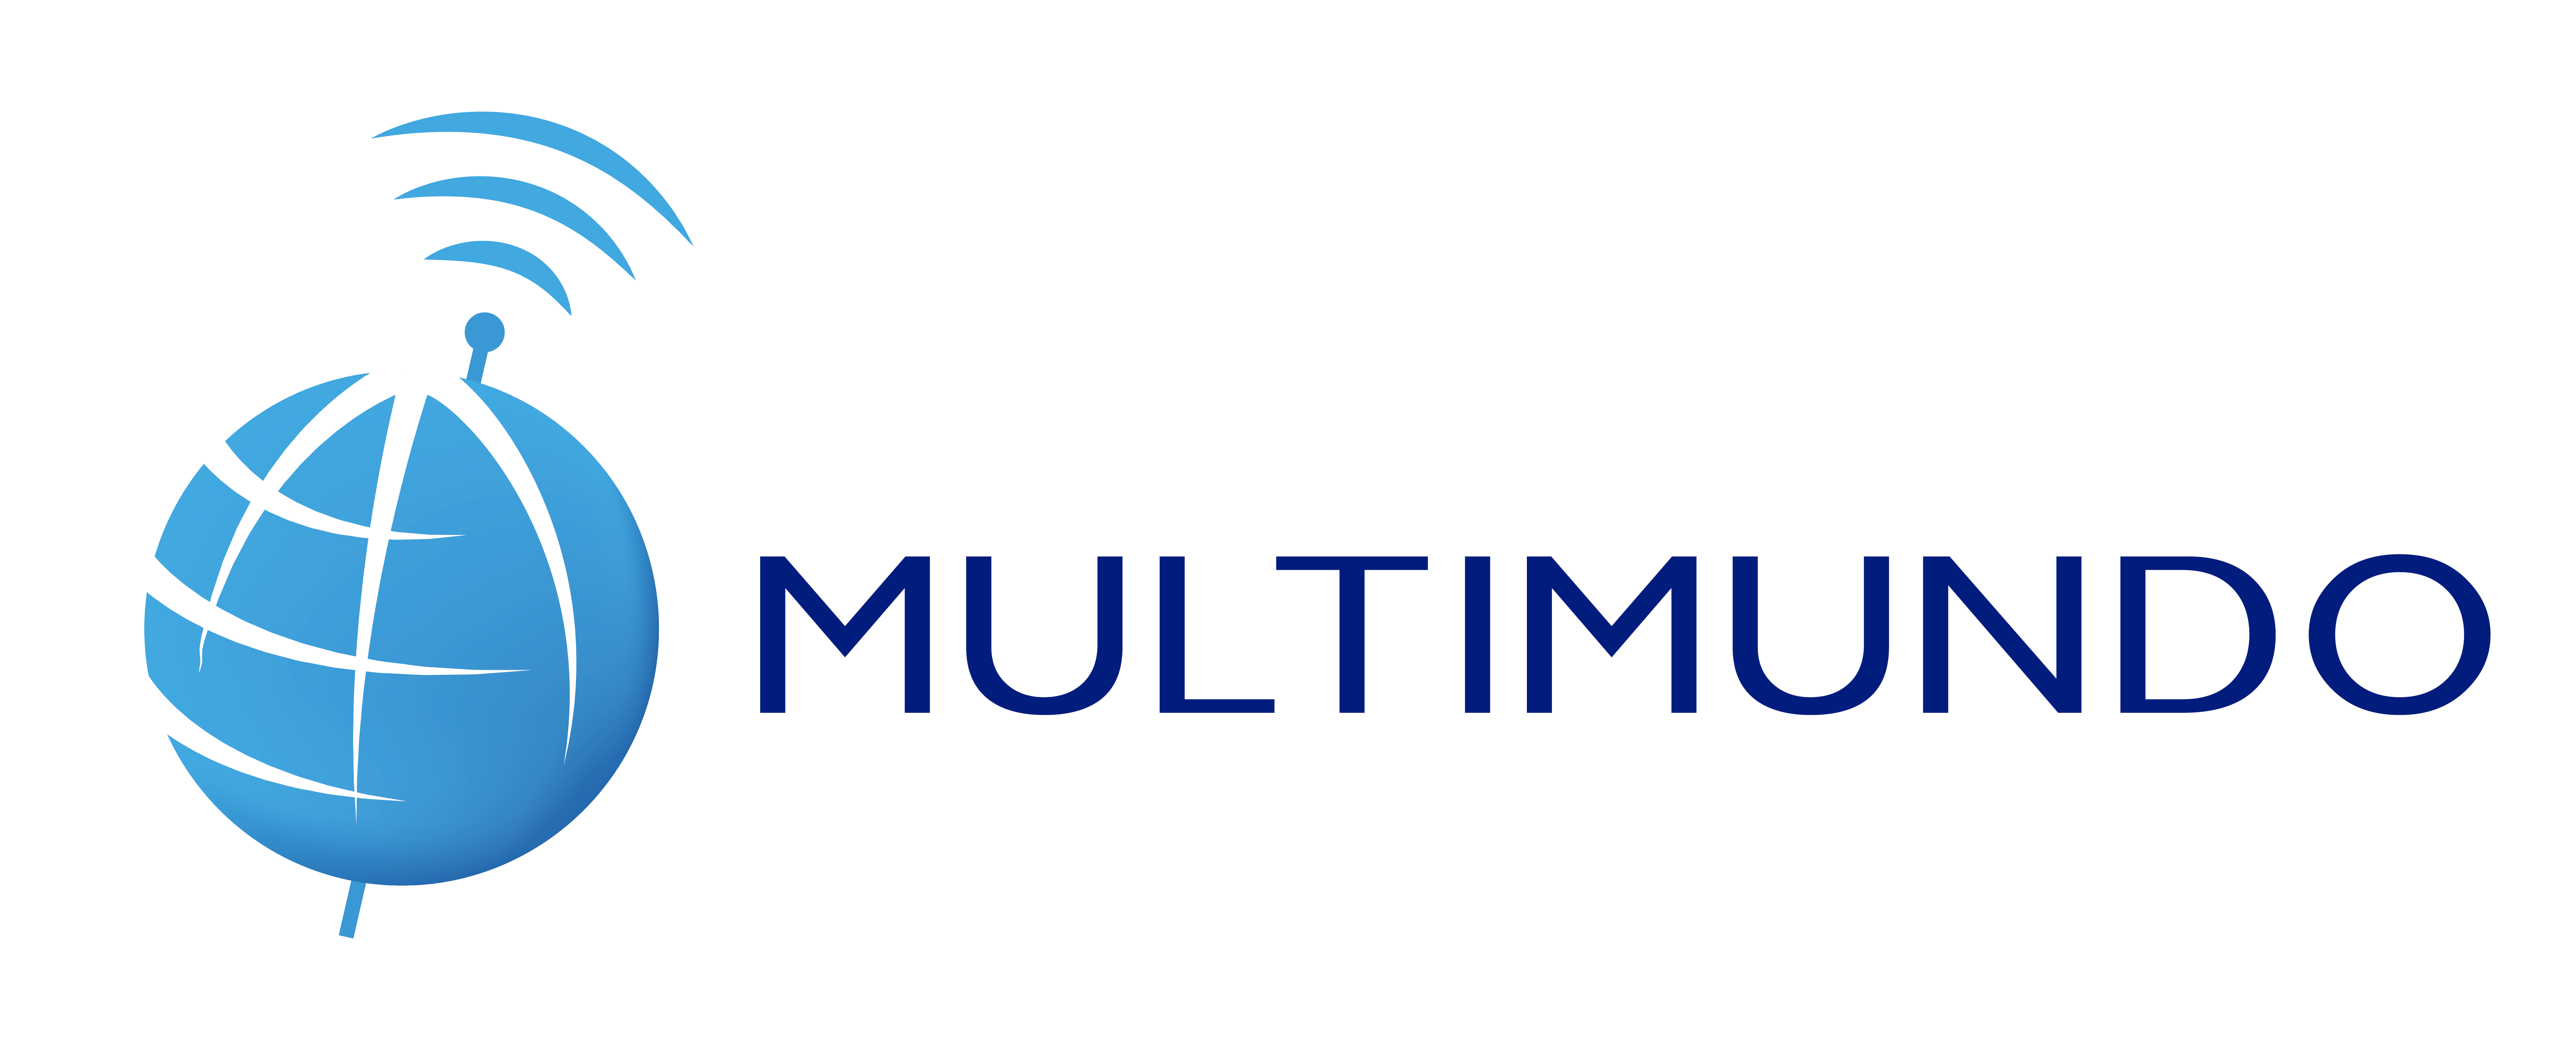 Multimundo